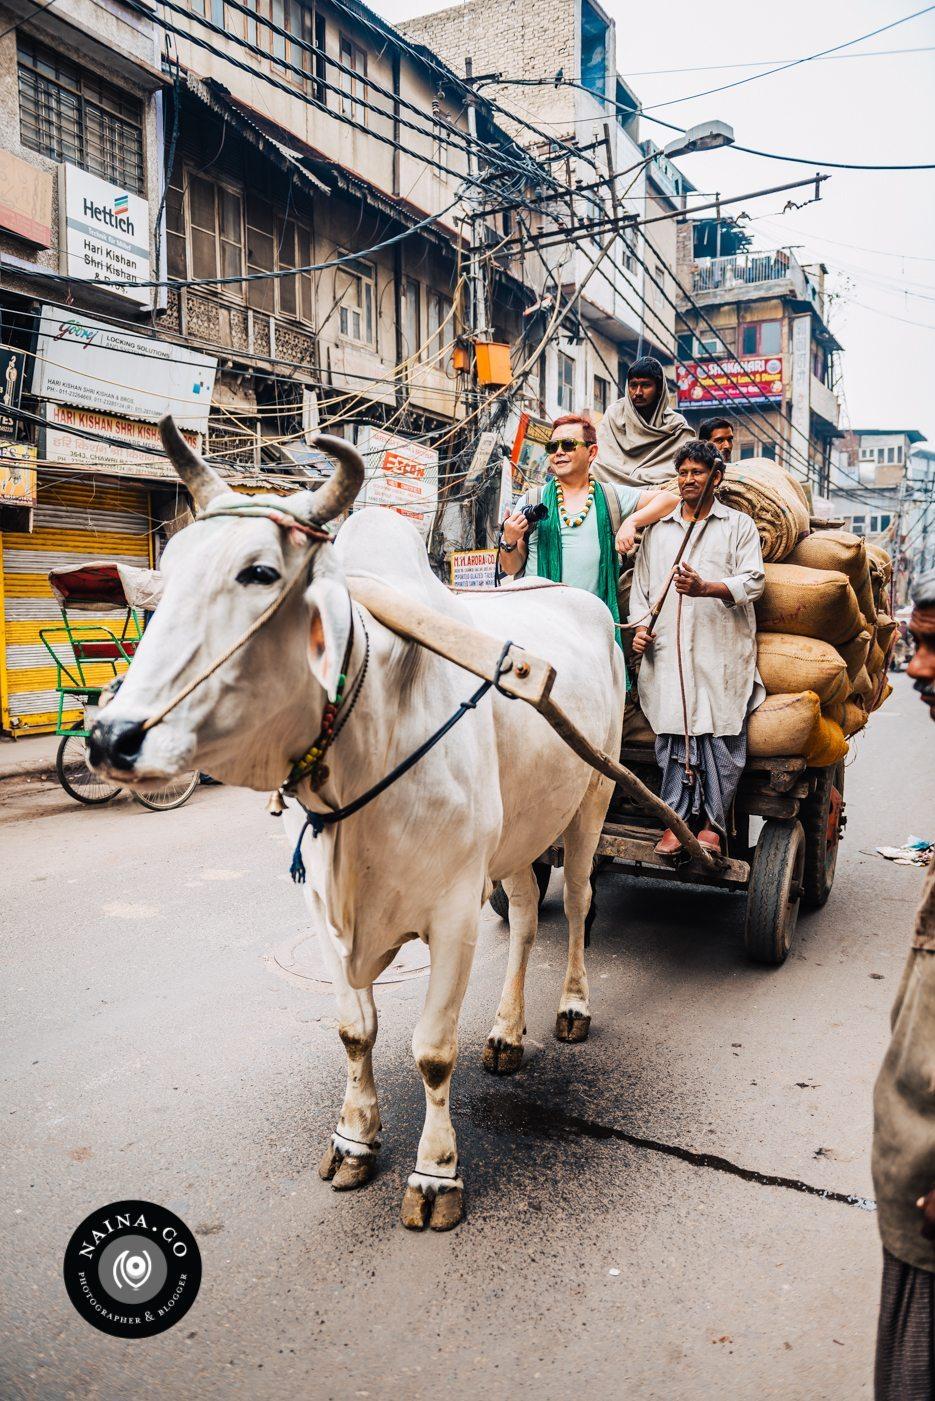 Naina.co-Raconteuse-Visuelle-Photographer-Blogger-Storyteller-Luxury-Lifestyle-March-2015-Old-Delhi-Destination-Unlocked-LeMeridien